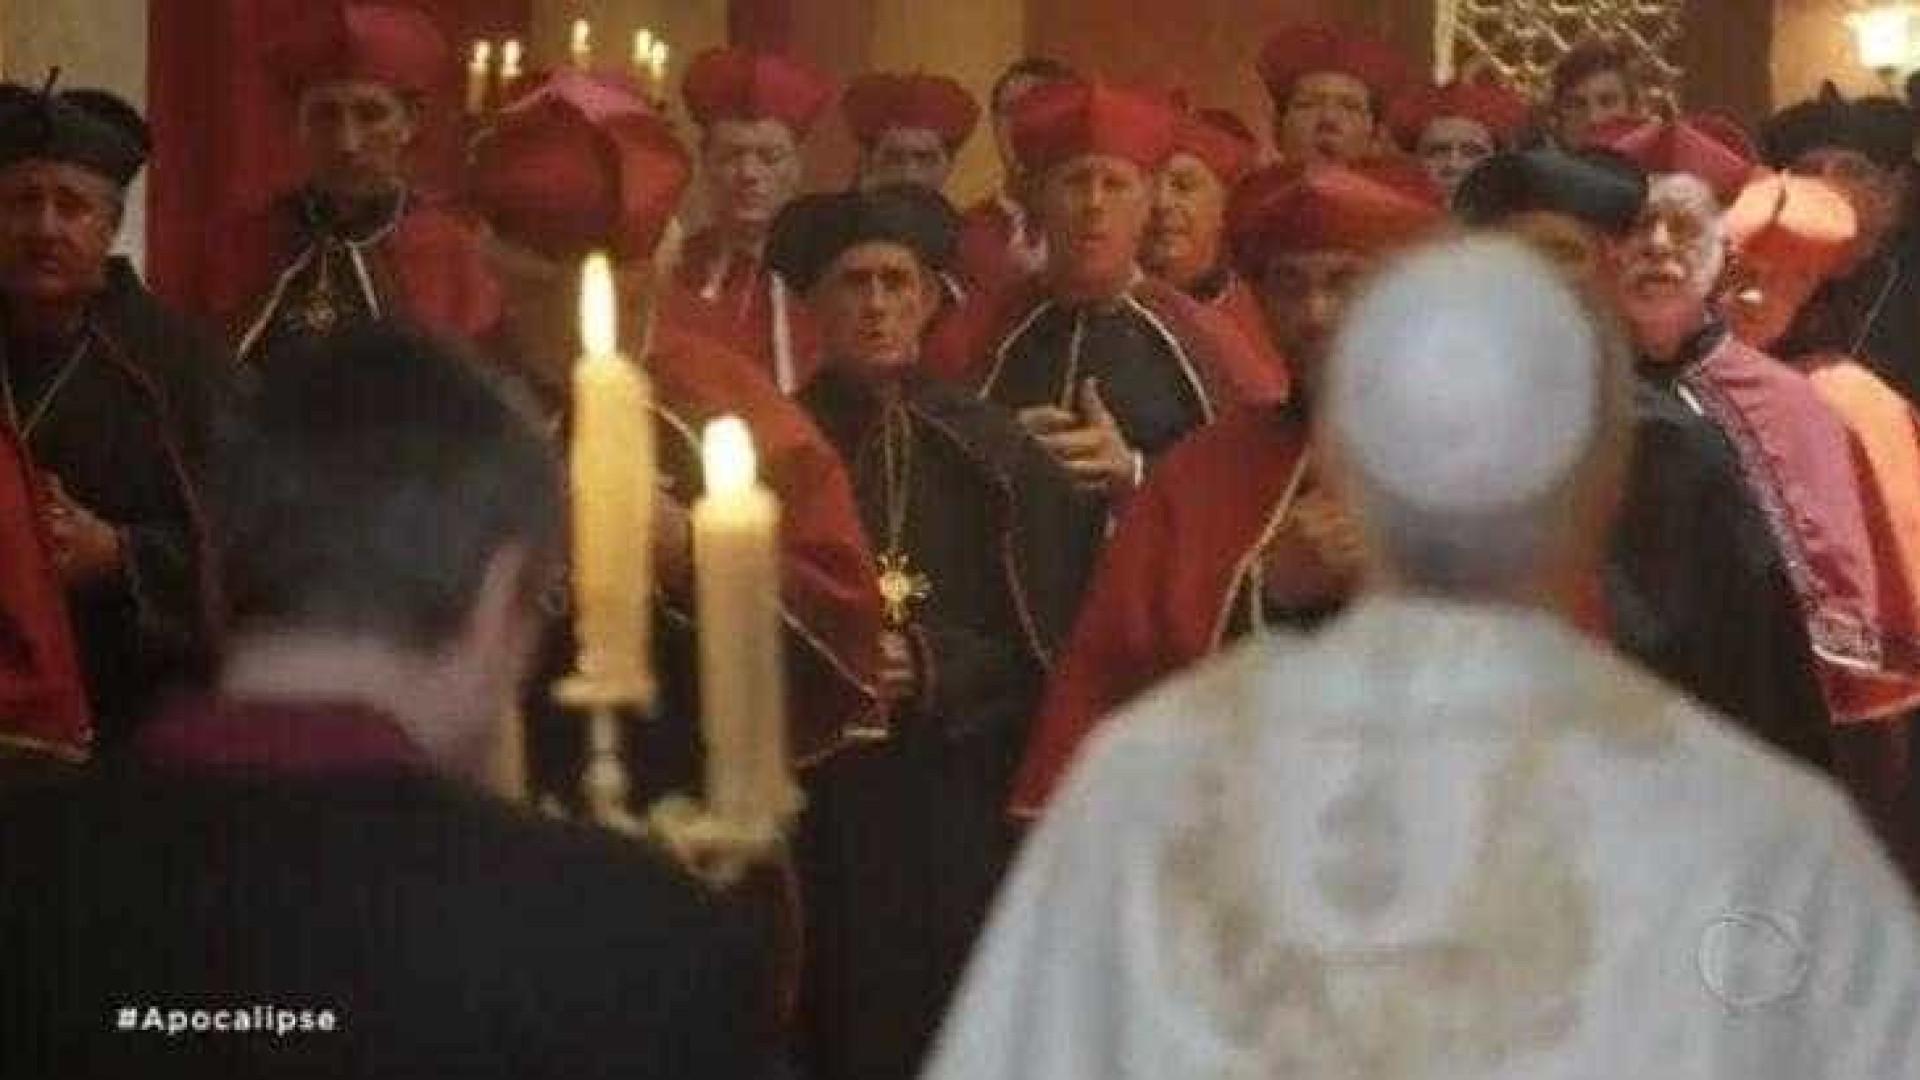 Em 'Apocalipse', Record ataca Igreja Católica e tem anticristo romano